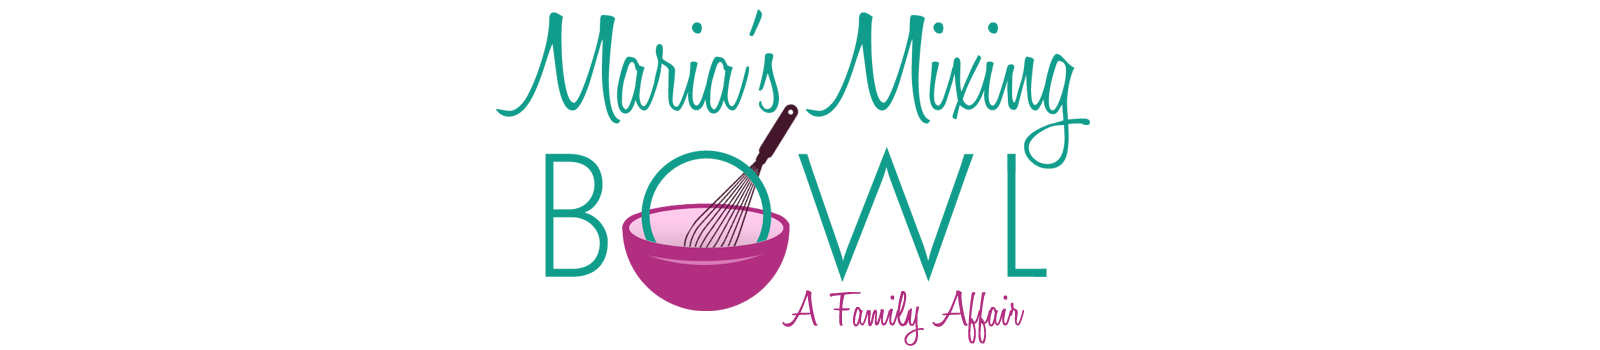 Maria's Mixing Bowl